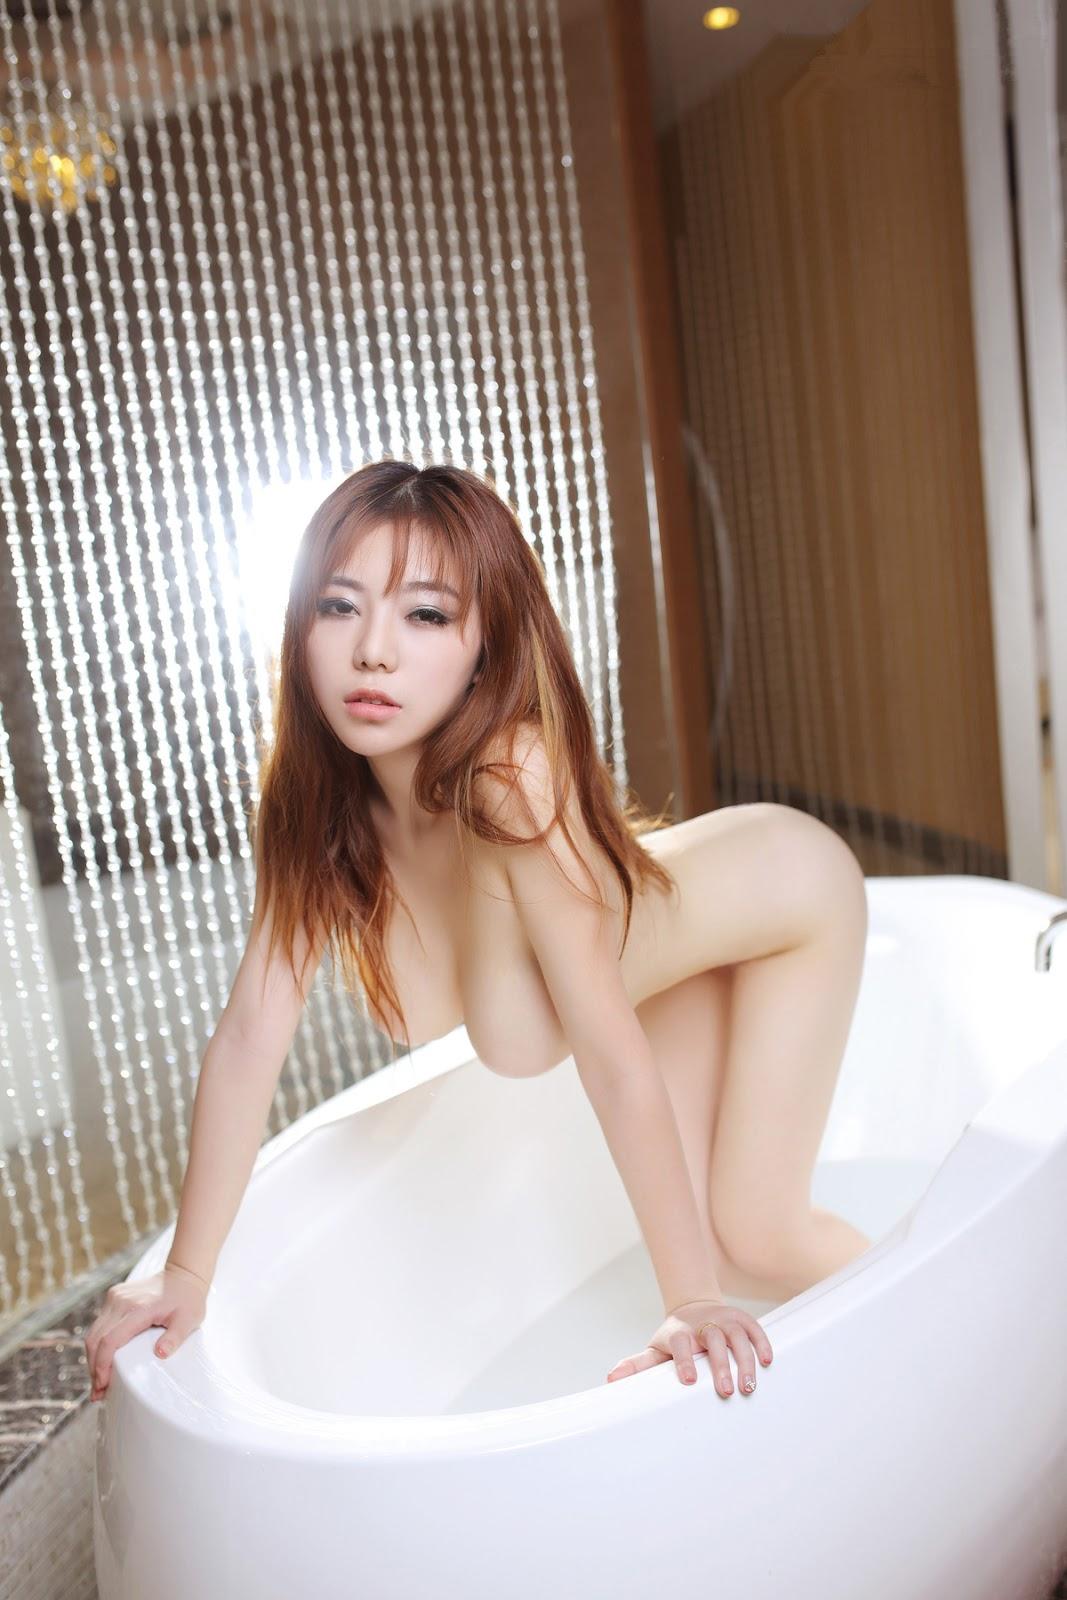 %2529%252B%252B%25C2%25A6%25C2%25B7 14 - TGOD Sexy Nude FAYE